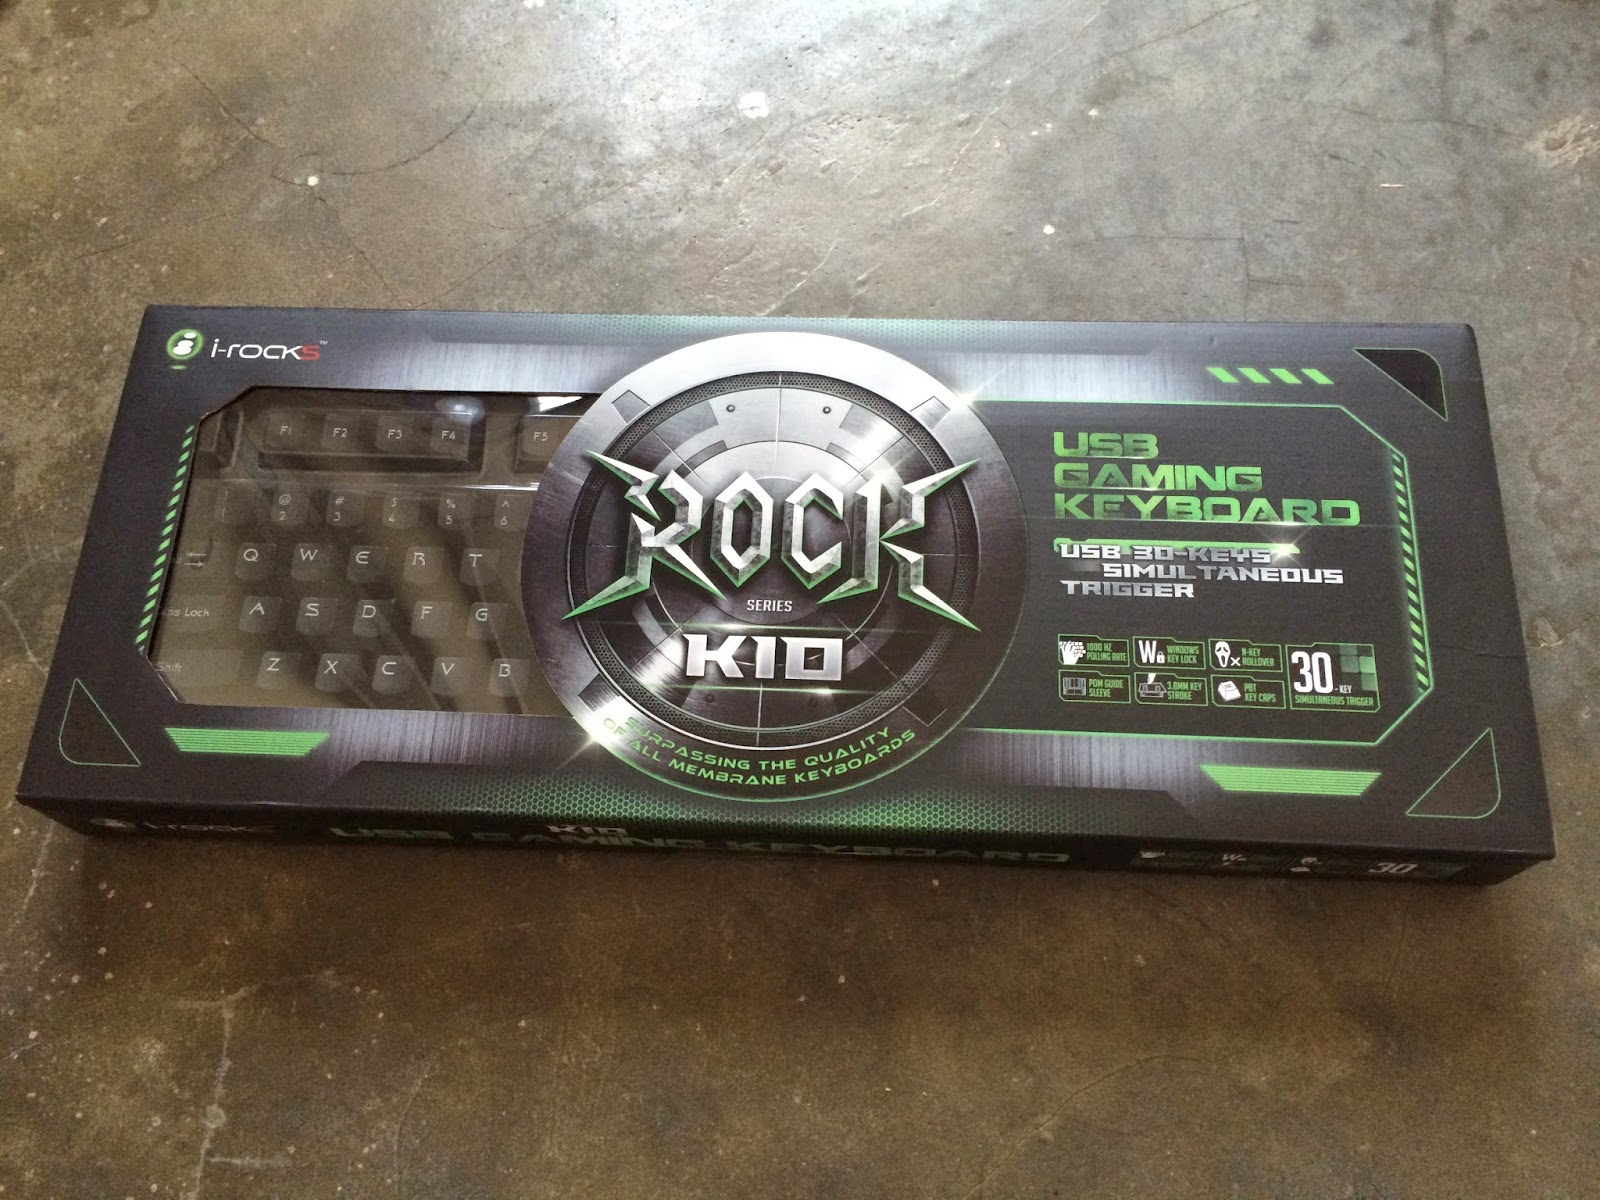 Unboxing & Review: i-Rocks K10 Gaming Keyboard 50